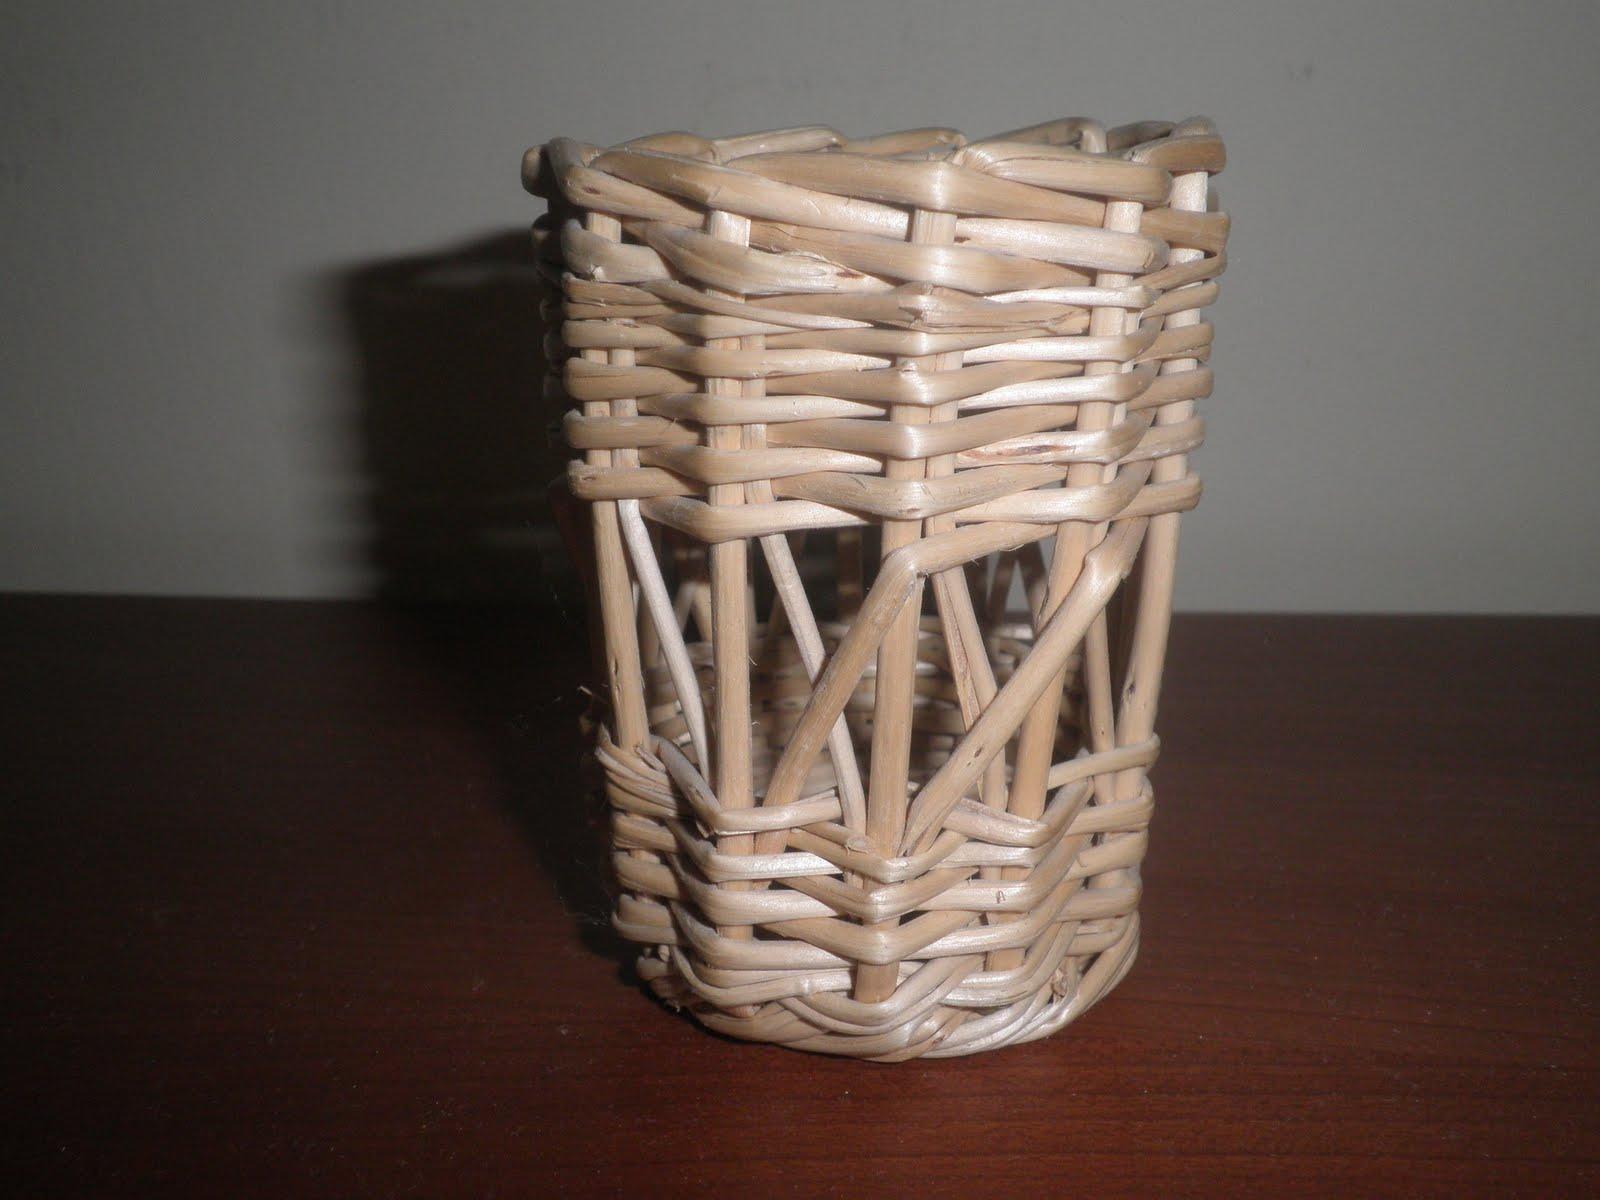 Manualidades pura peque os objetos hechos con m dula for Objetos hechos con marmol